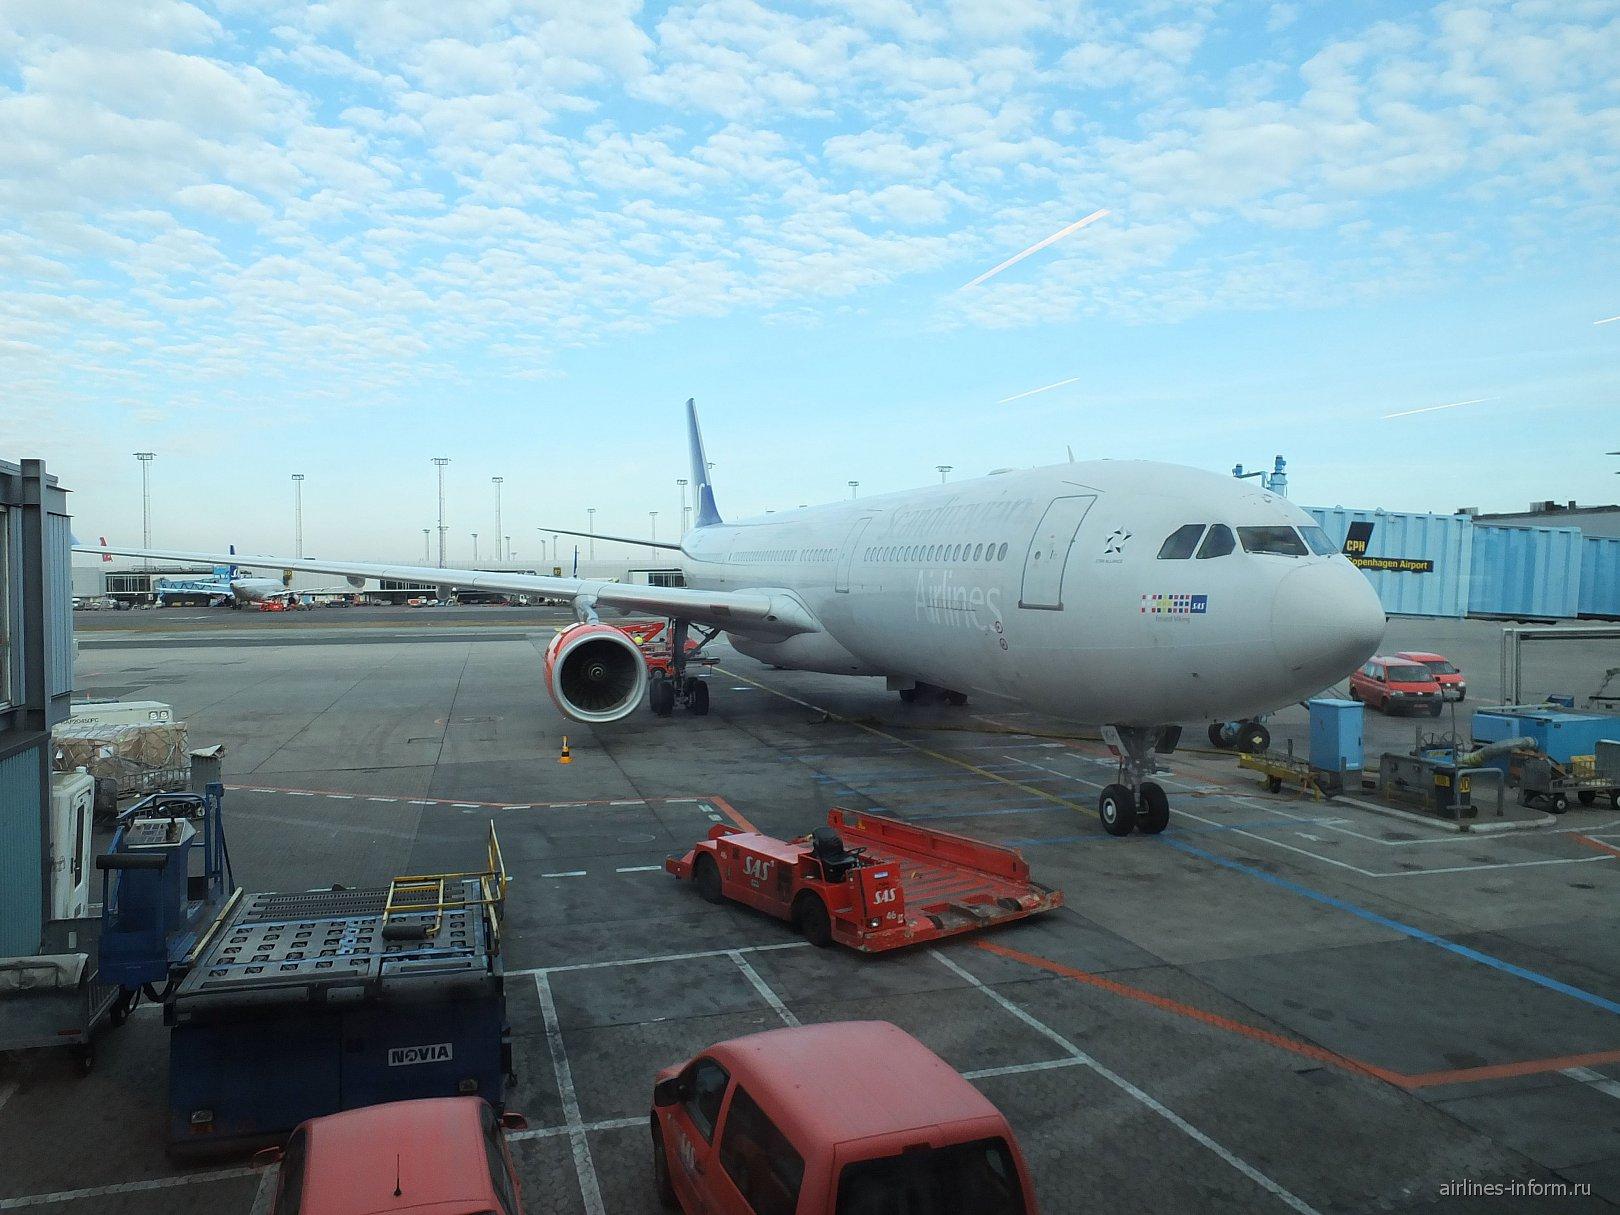 Airbus A330-300 авиакомпании SAS в аэропорту Копенгаген Каструп